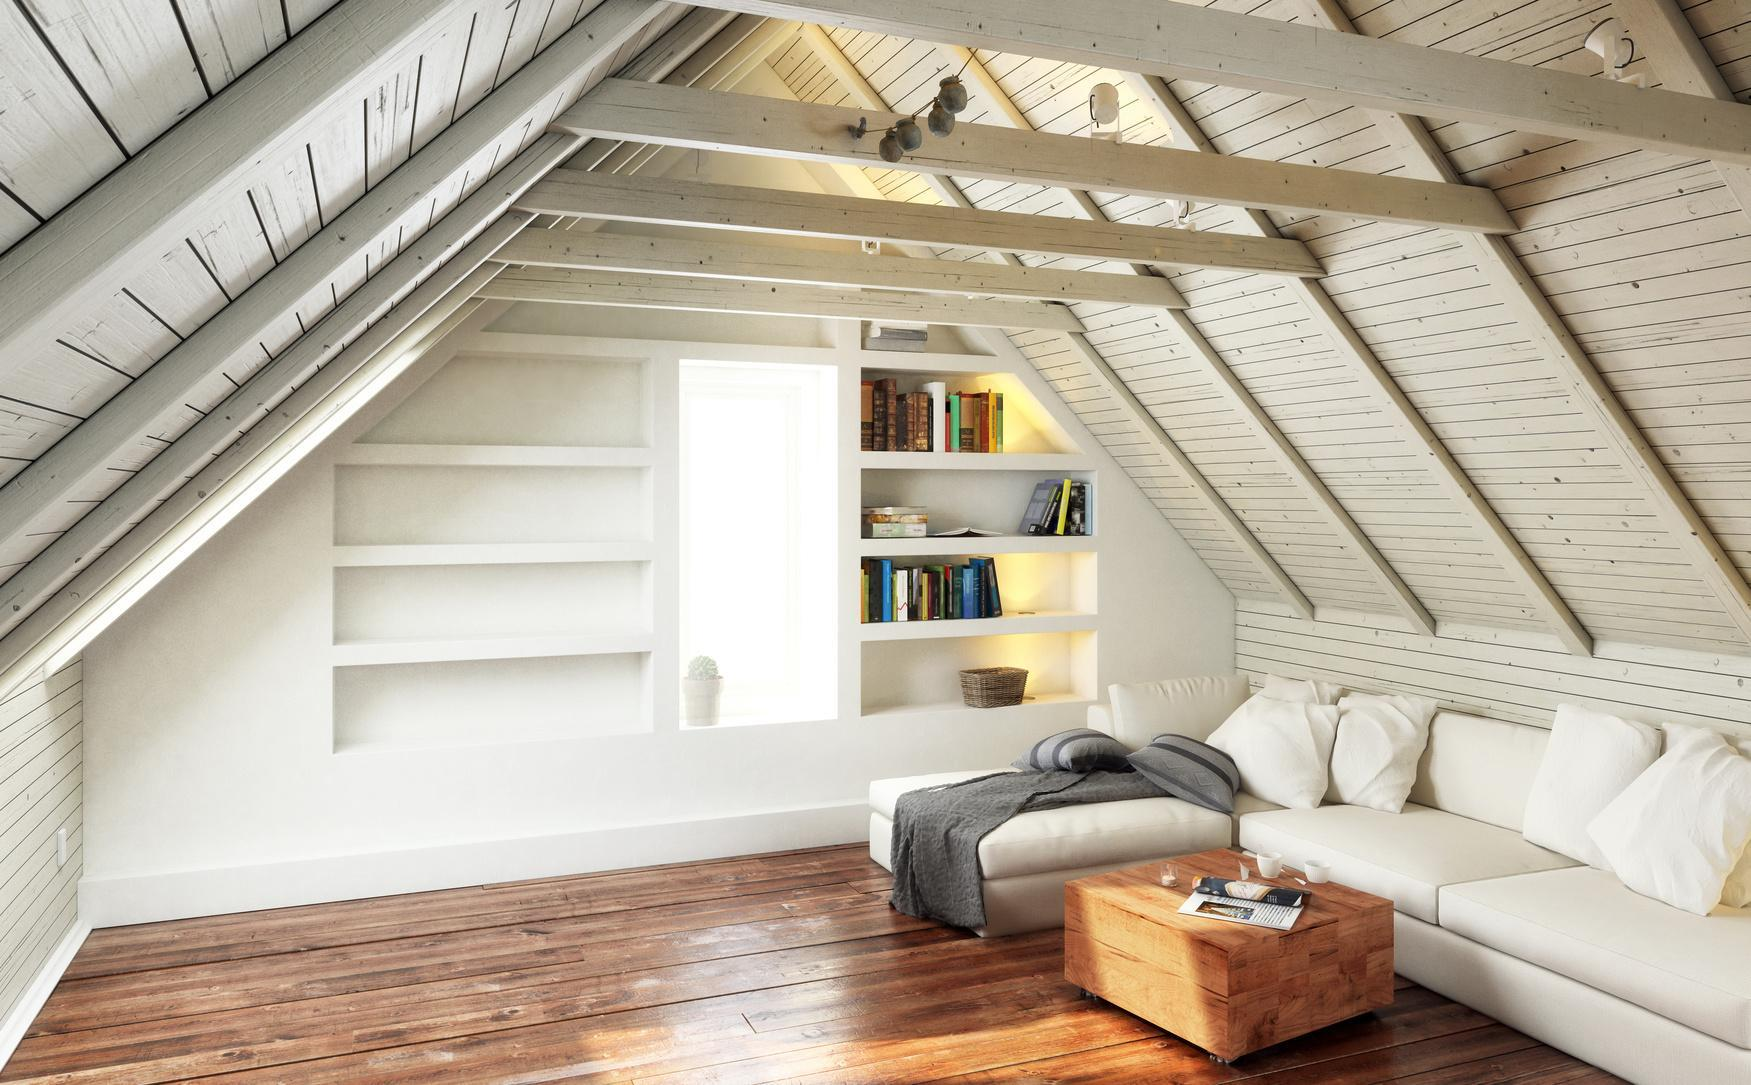 reba immobilien ag immobilienmakler hotelmakler off market immobilien reba immobilien ag. Black Bedroom Furniture Sets. Home Design Ideas